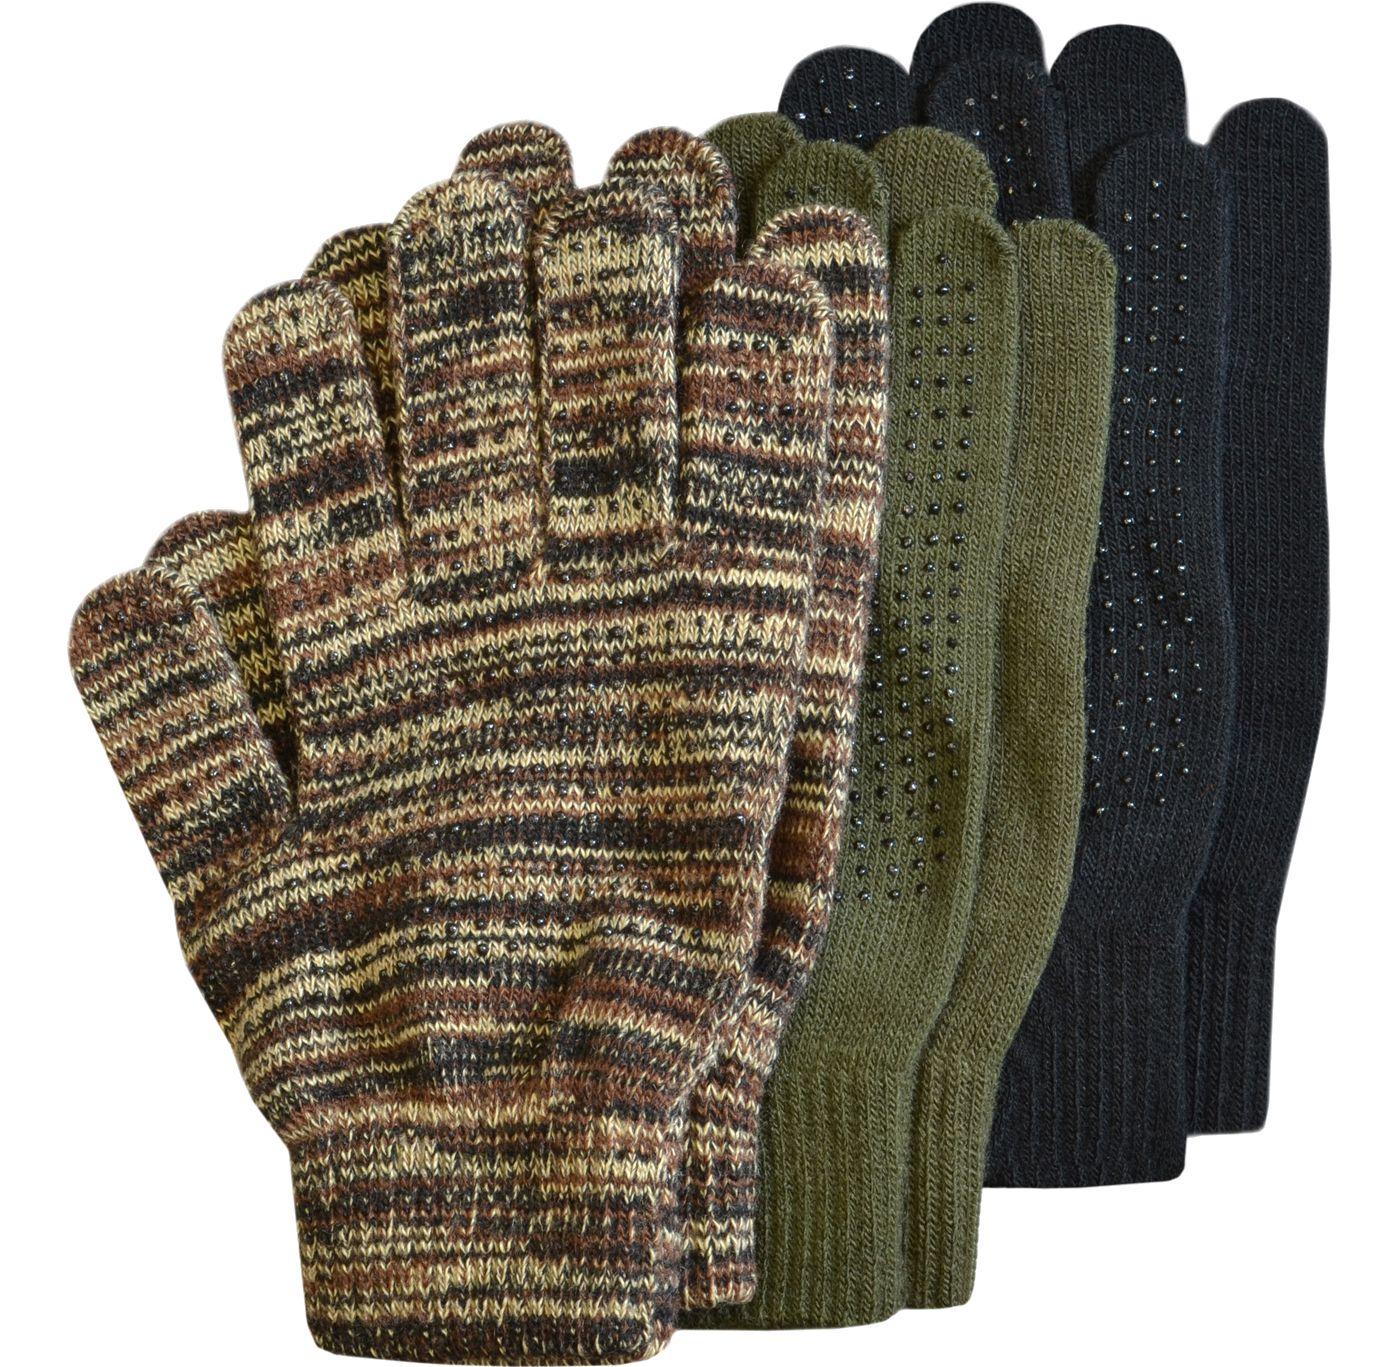 QuietWear Magic Gloves - 3 Pack